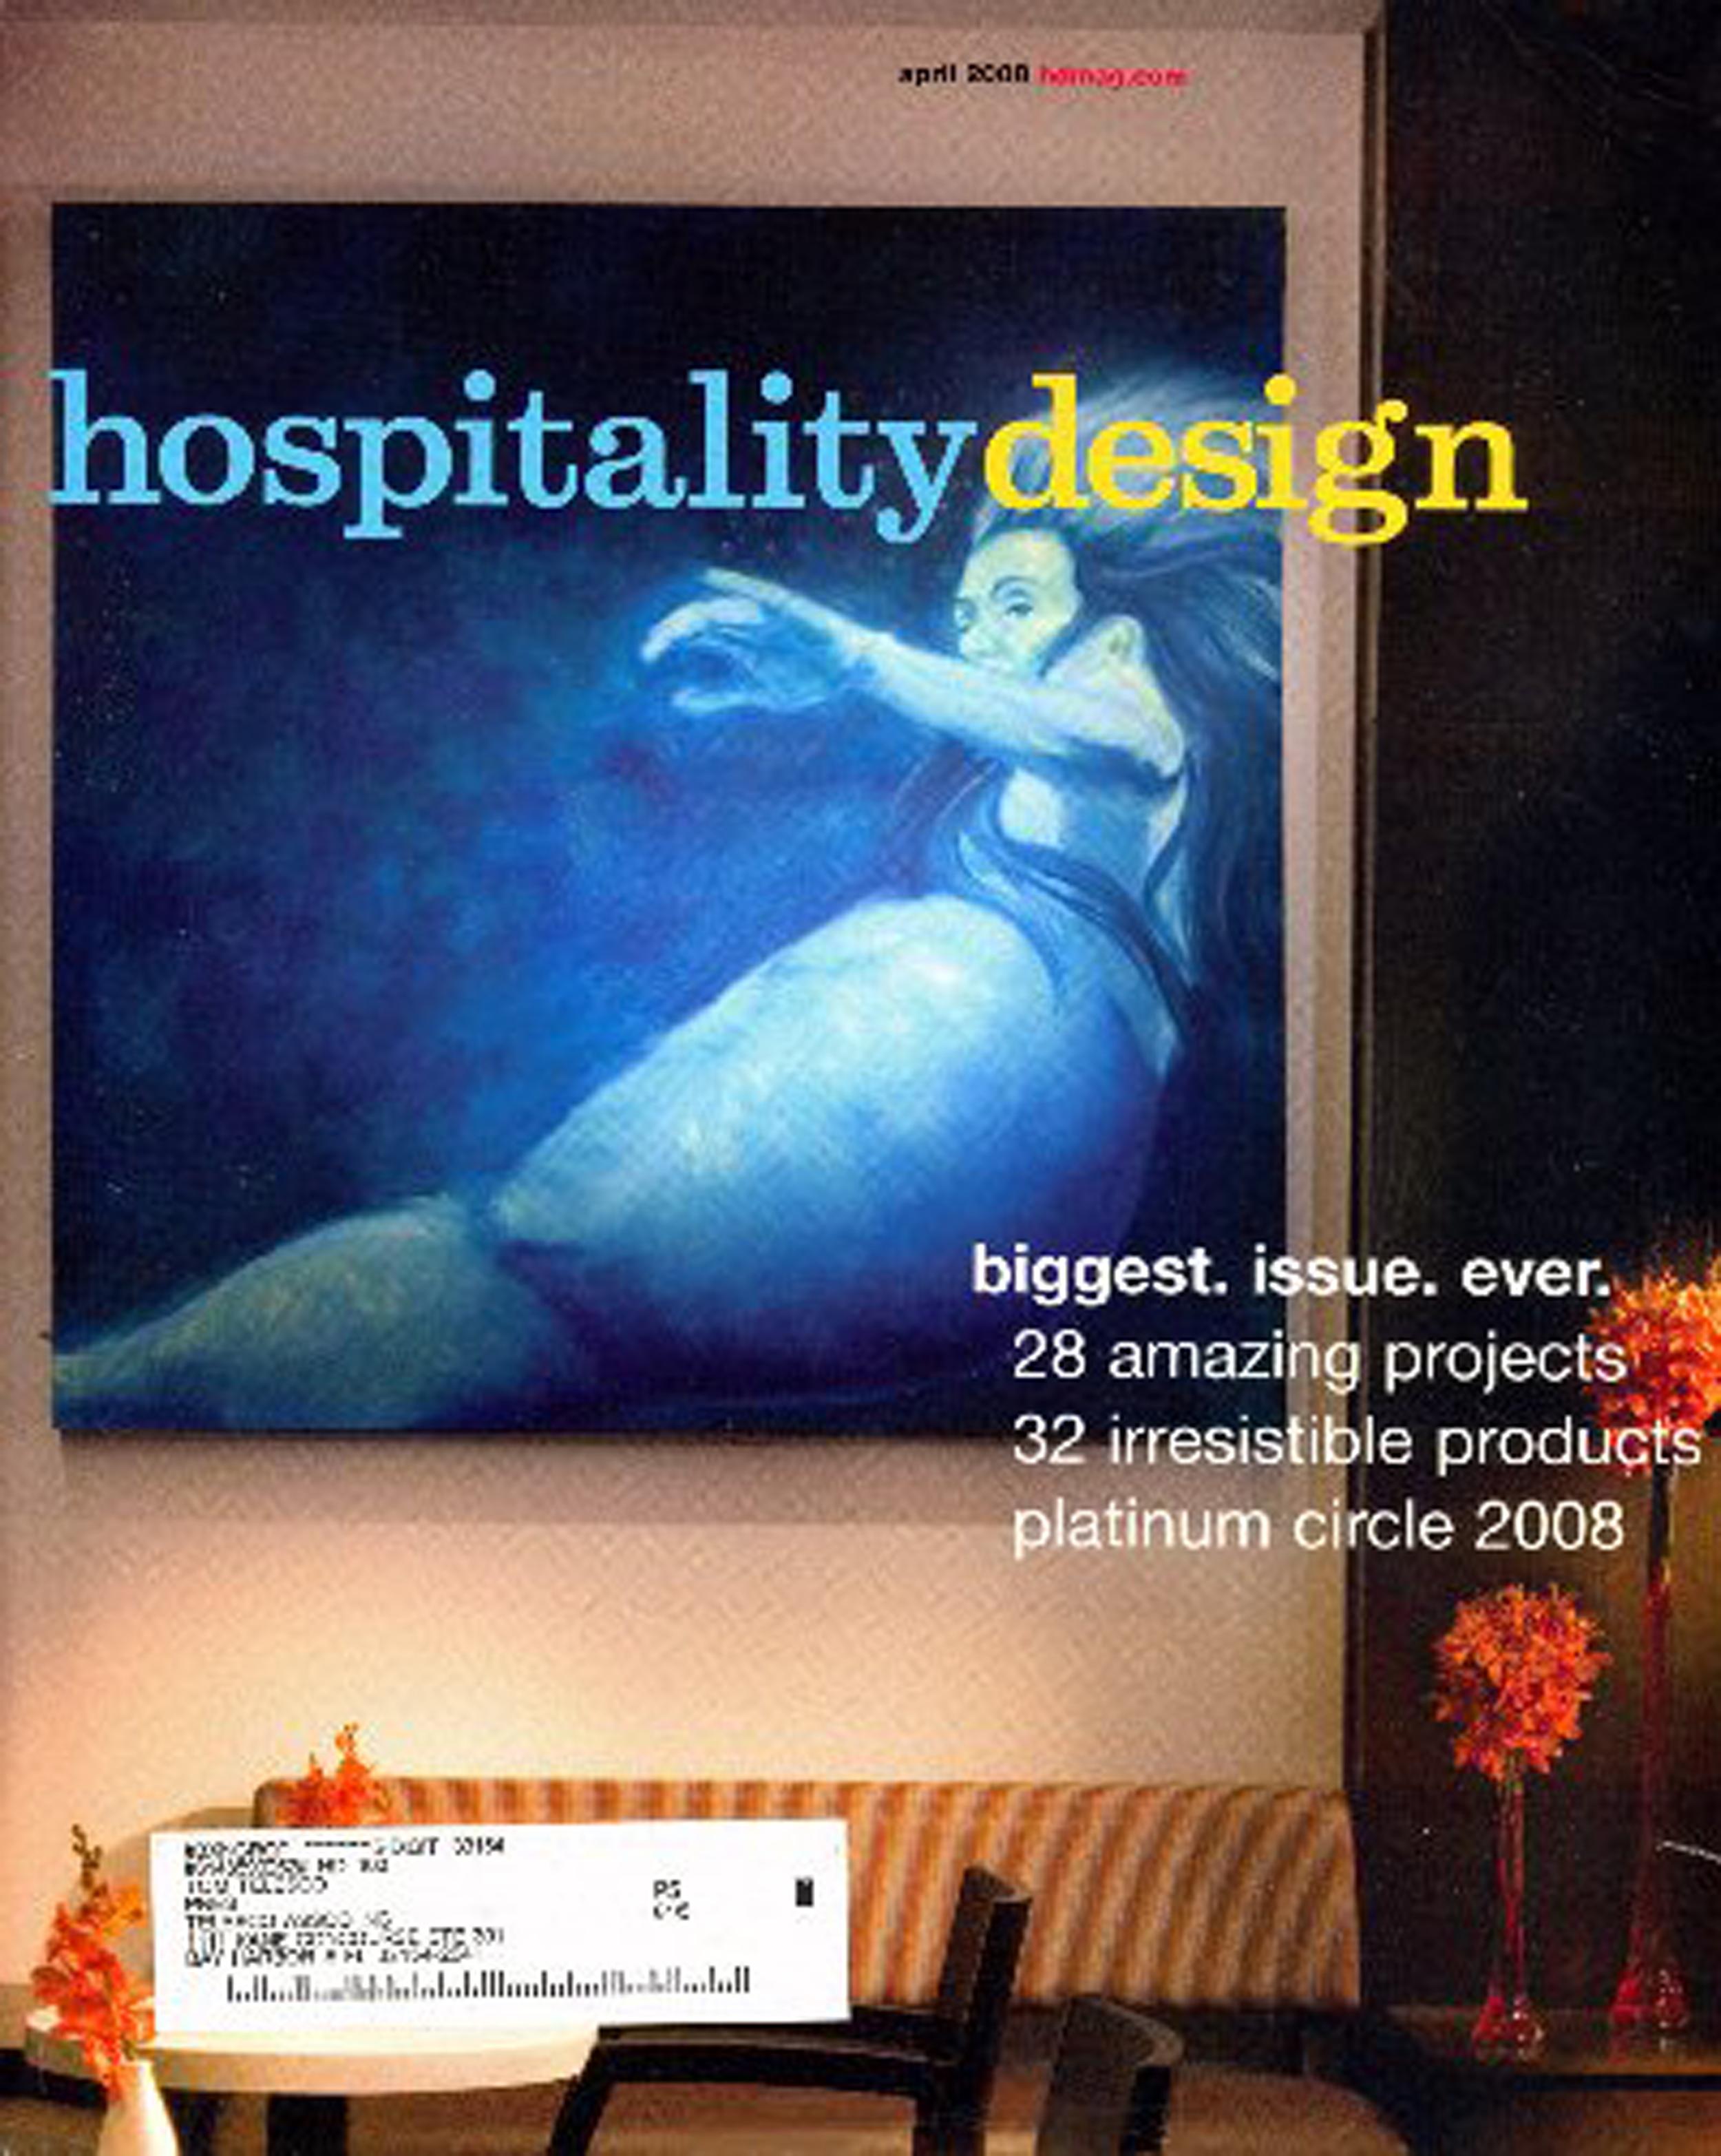 Hospitality Design Magazine - April 2008